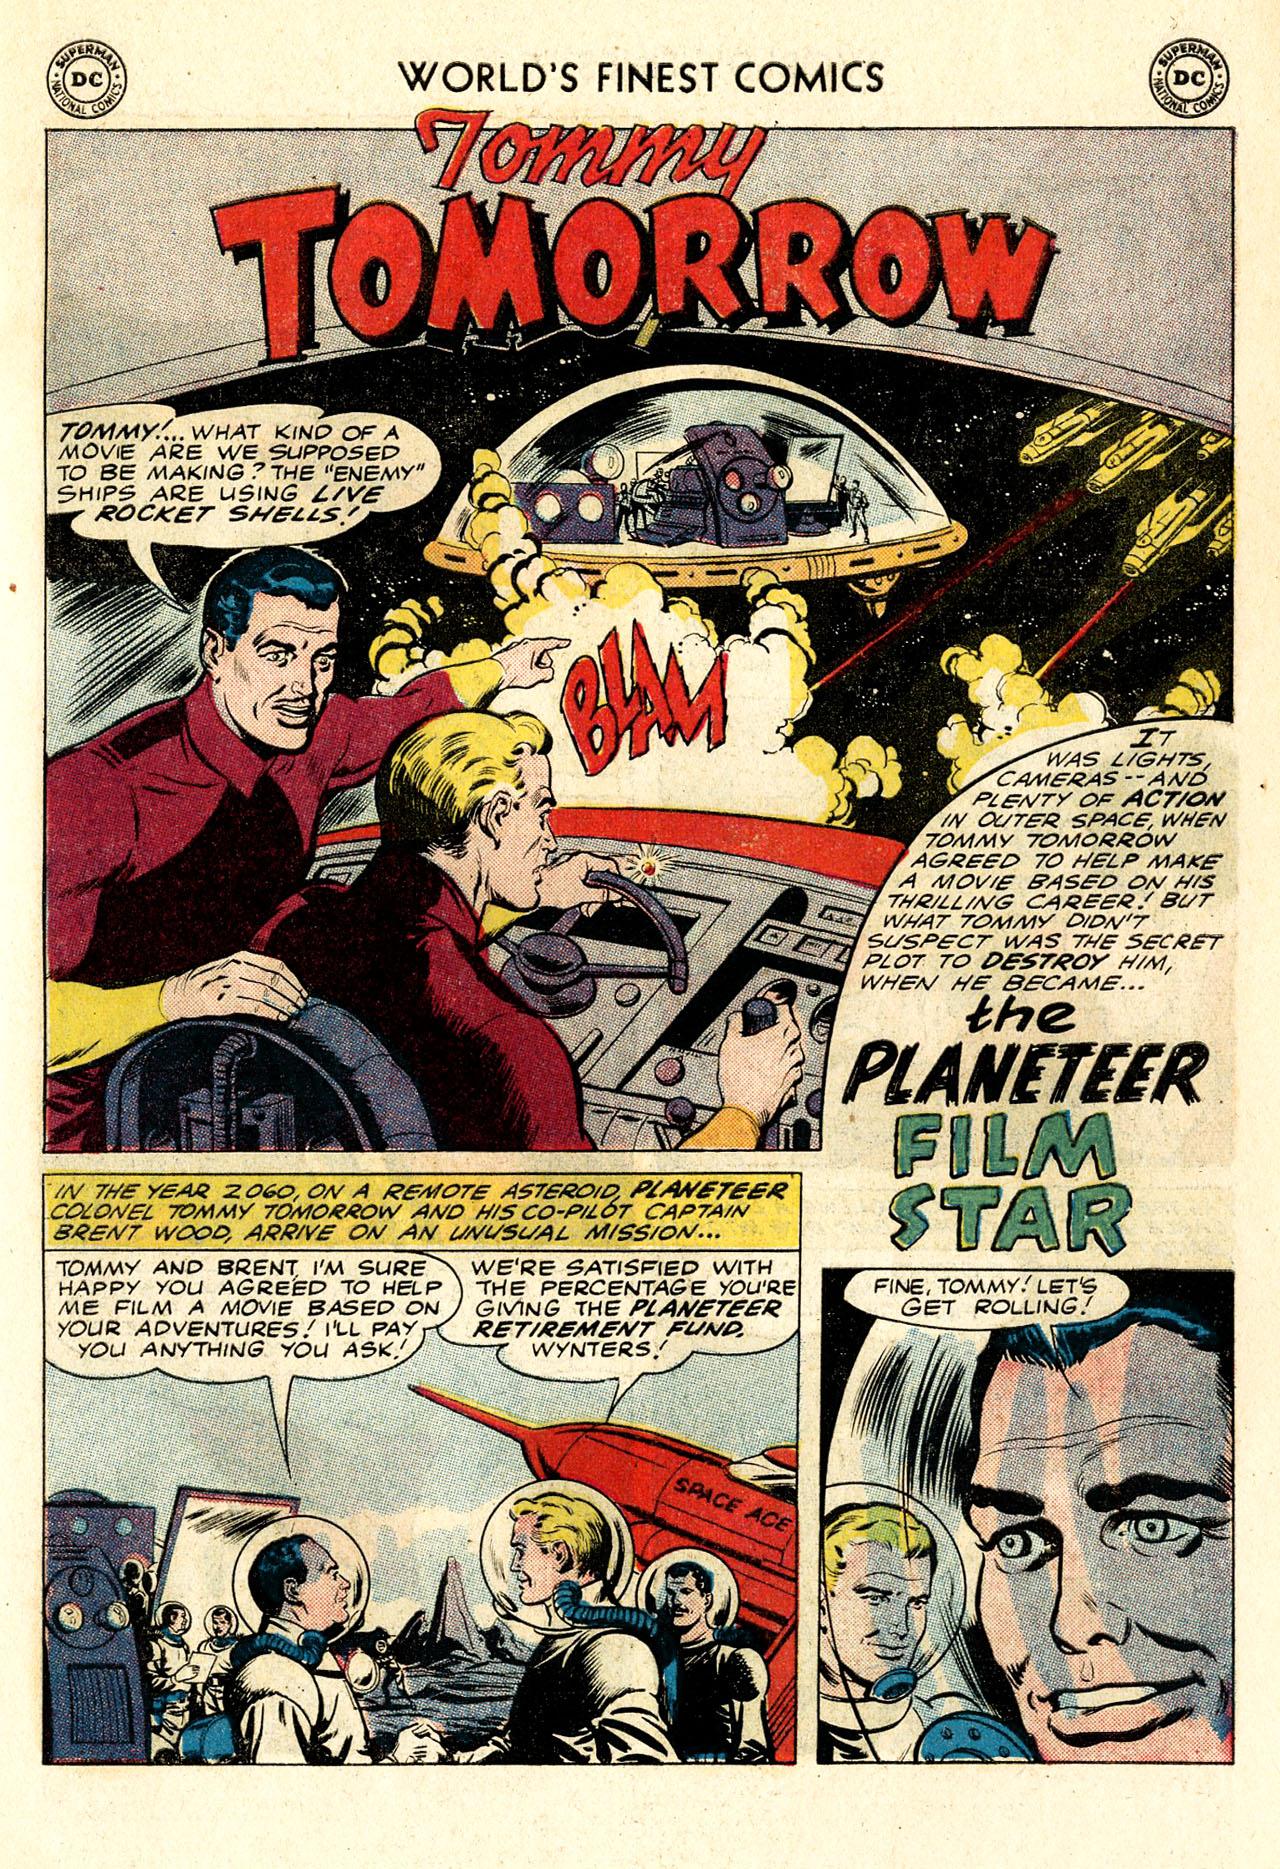 Read online World's Finest Comics comic -  Issue #107 - 19